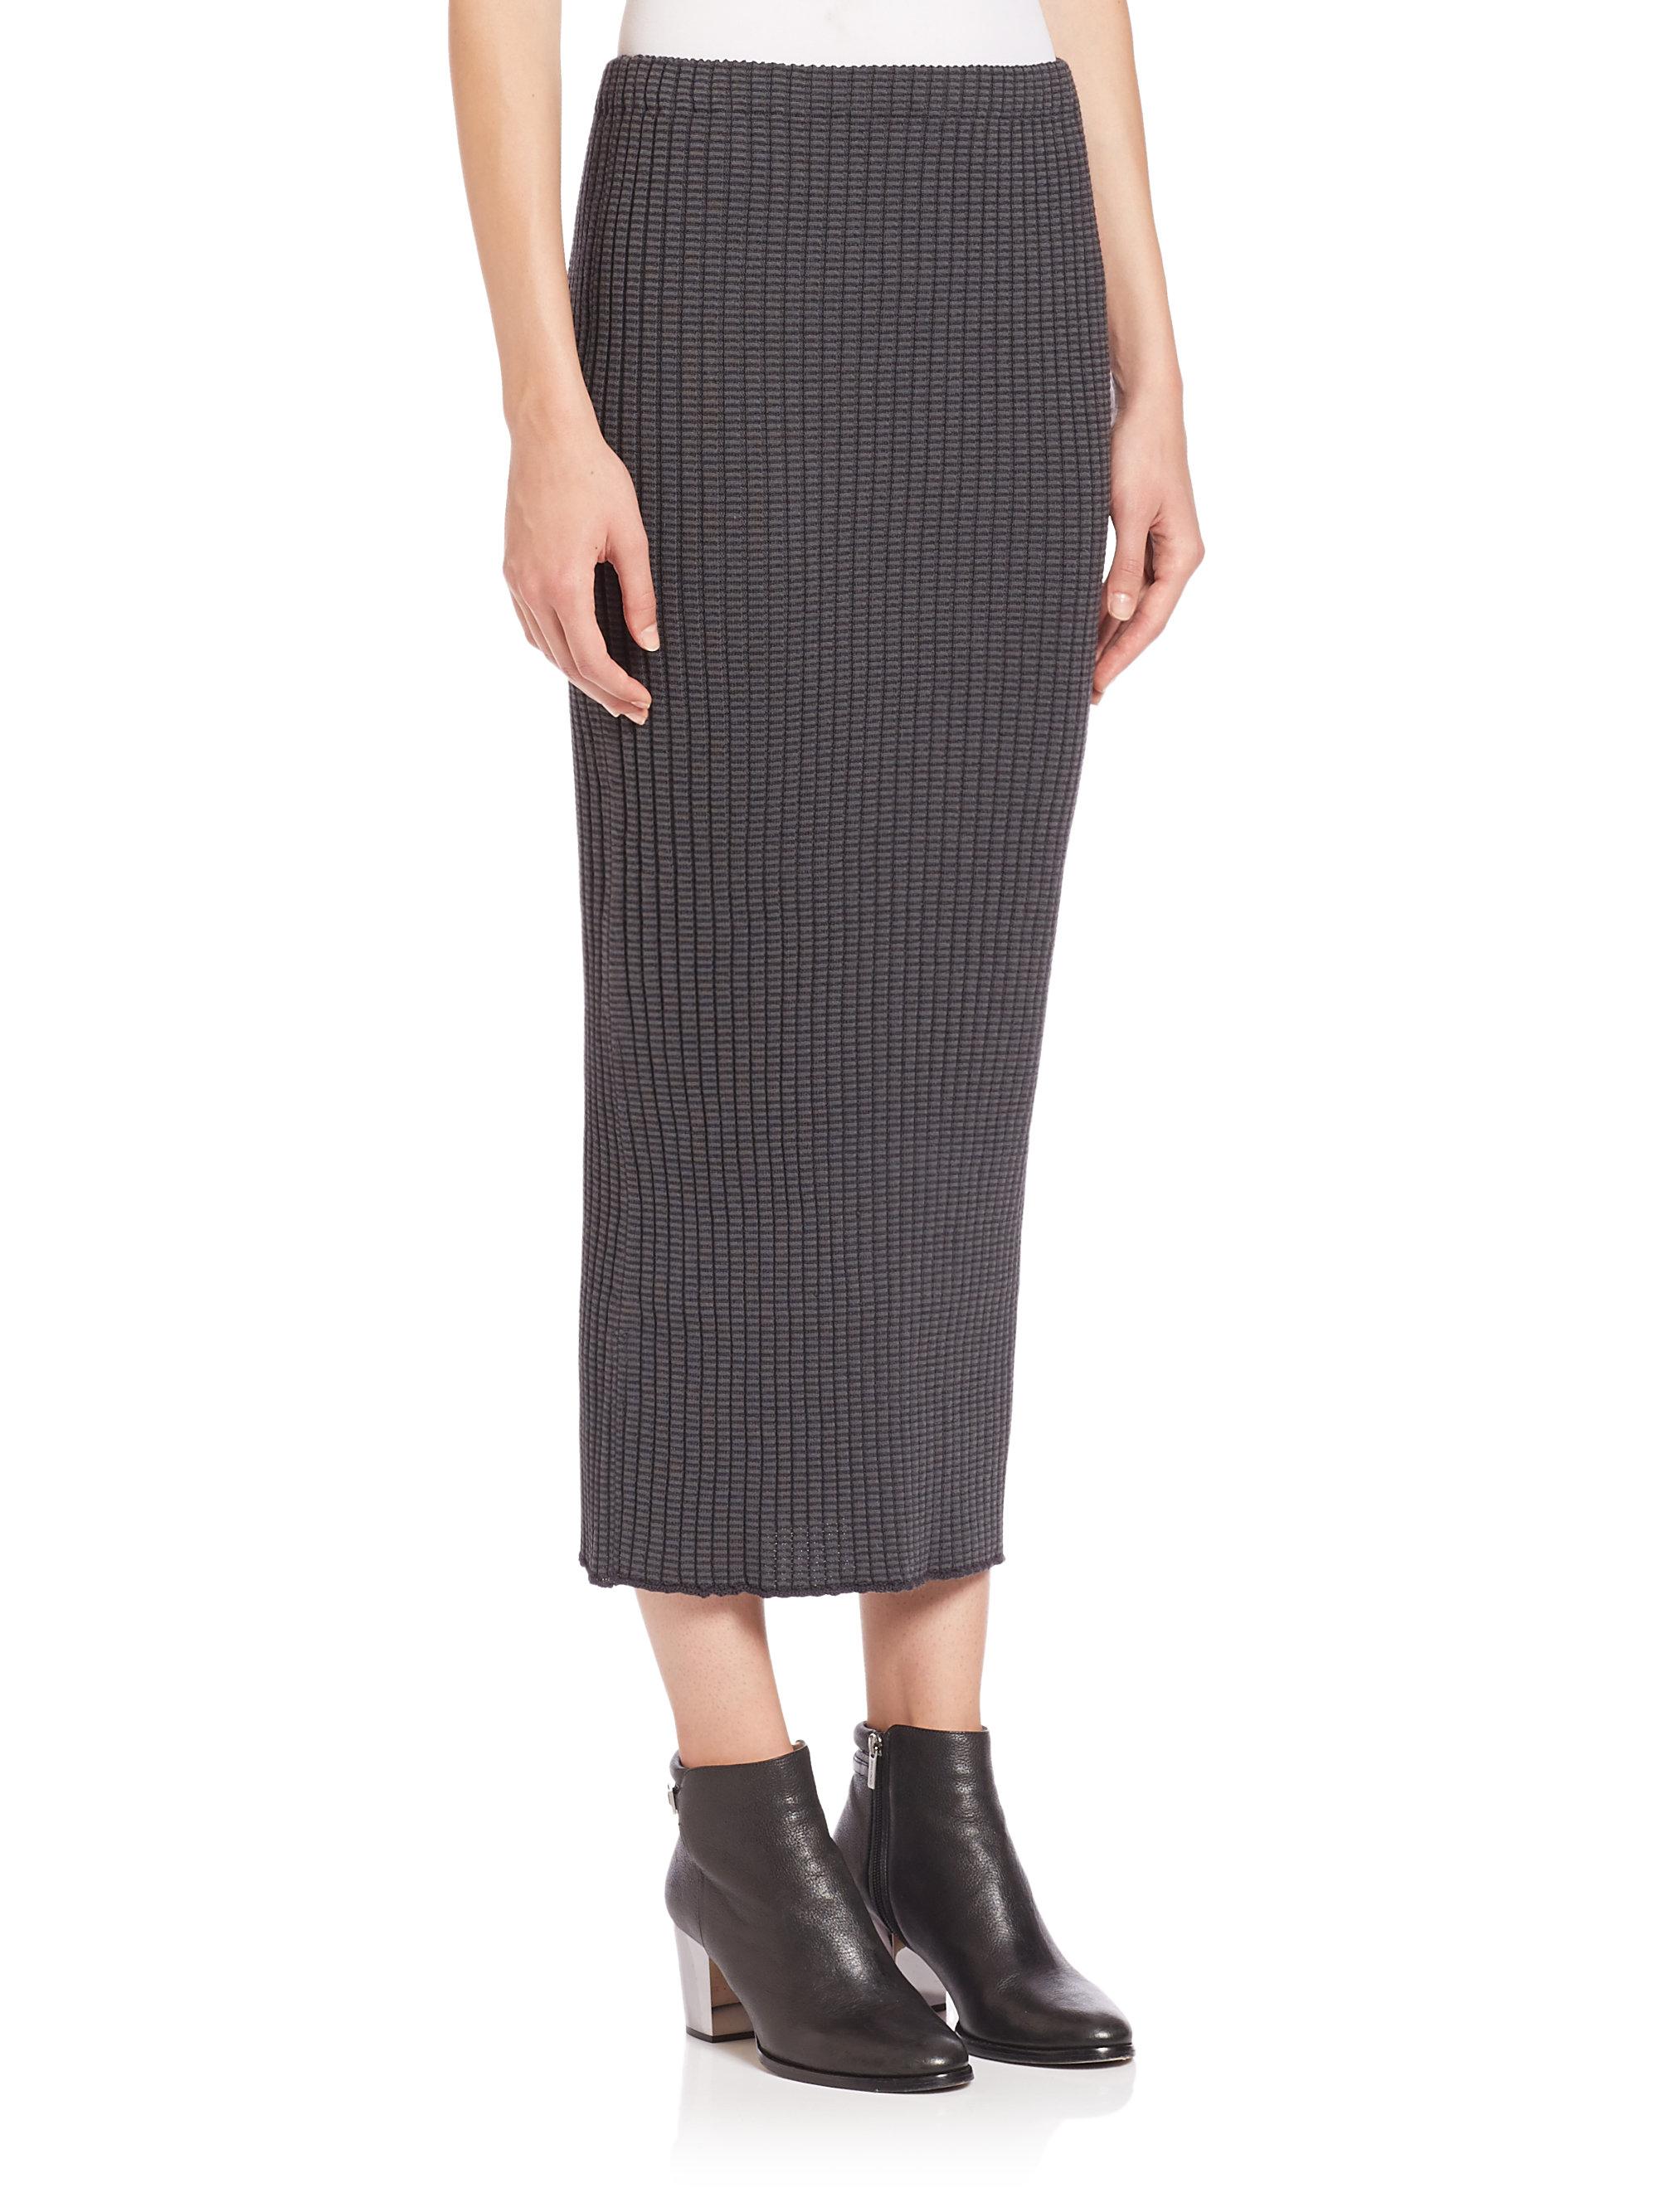 Wes gordon Rib-knit Pencil Skirt in Gray | Lyst